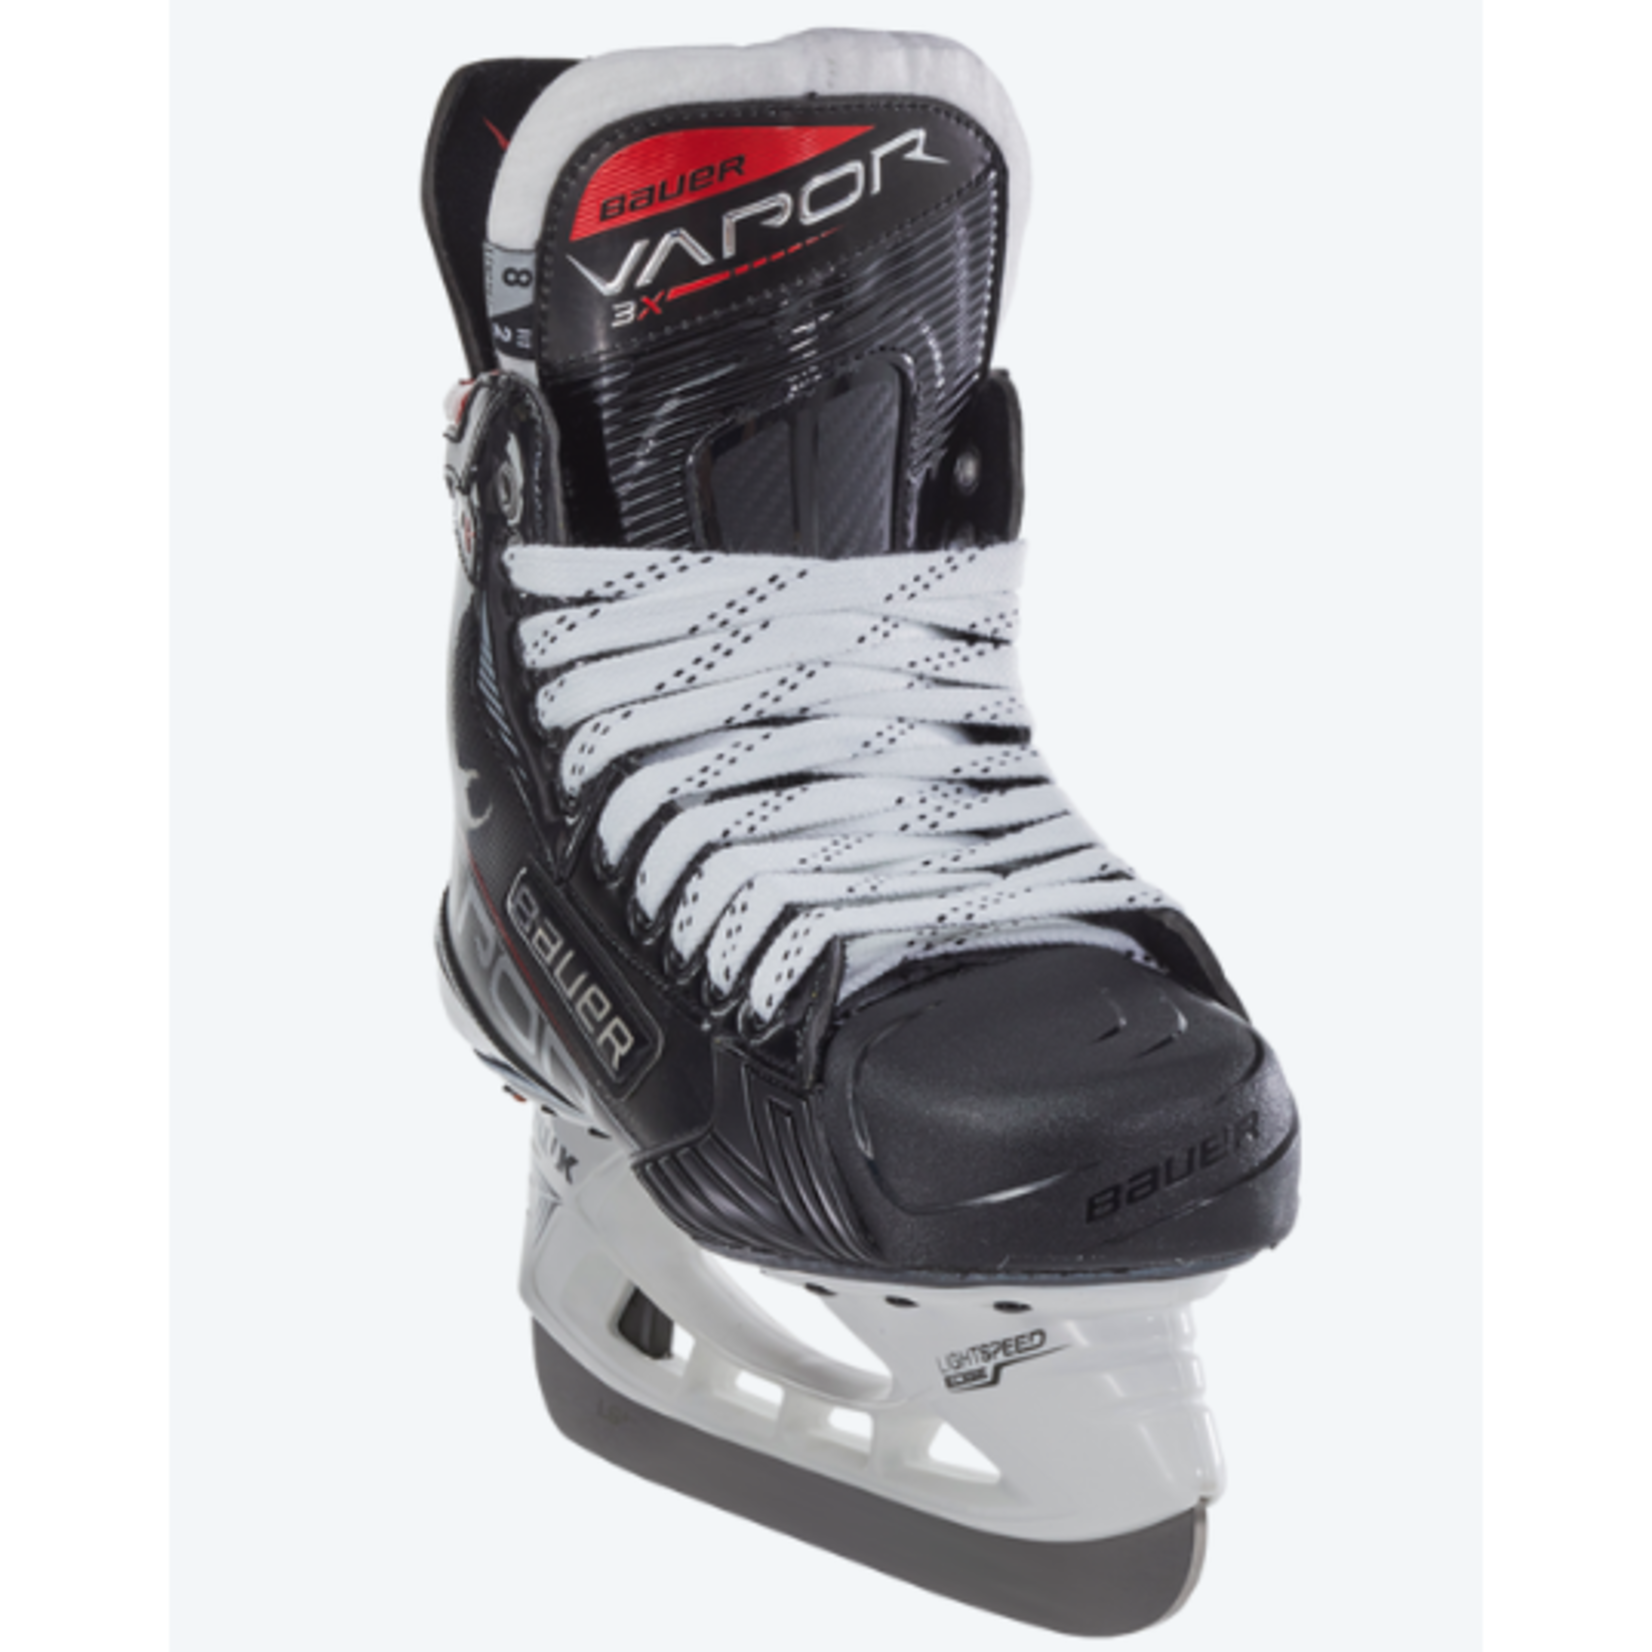 Bauer S21 BAUER Vapor 3X Skates SR